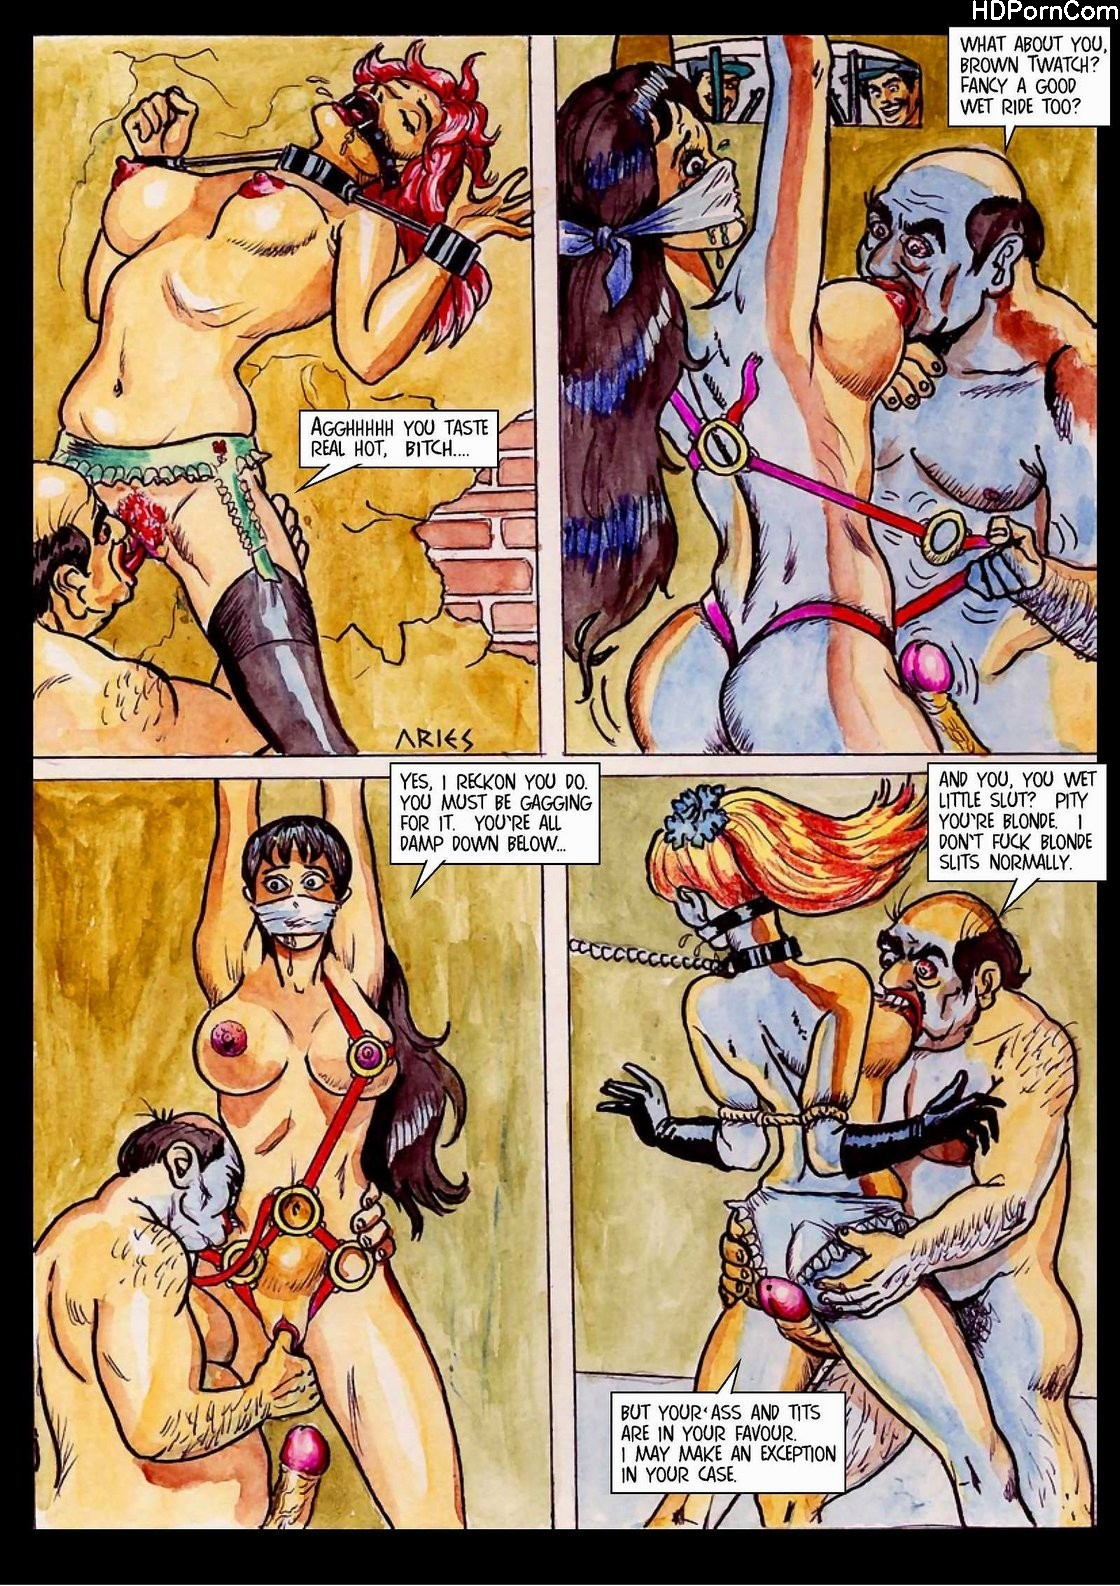 Bdsm 3D Comic Torture Porn Drawing Palace fansadox 001 - aries - torture brothel sexy comics - cartoon